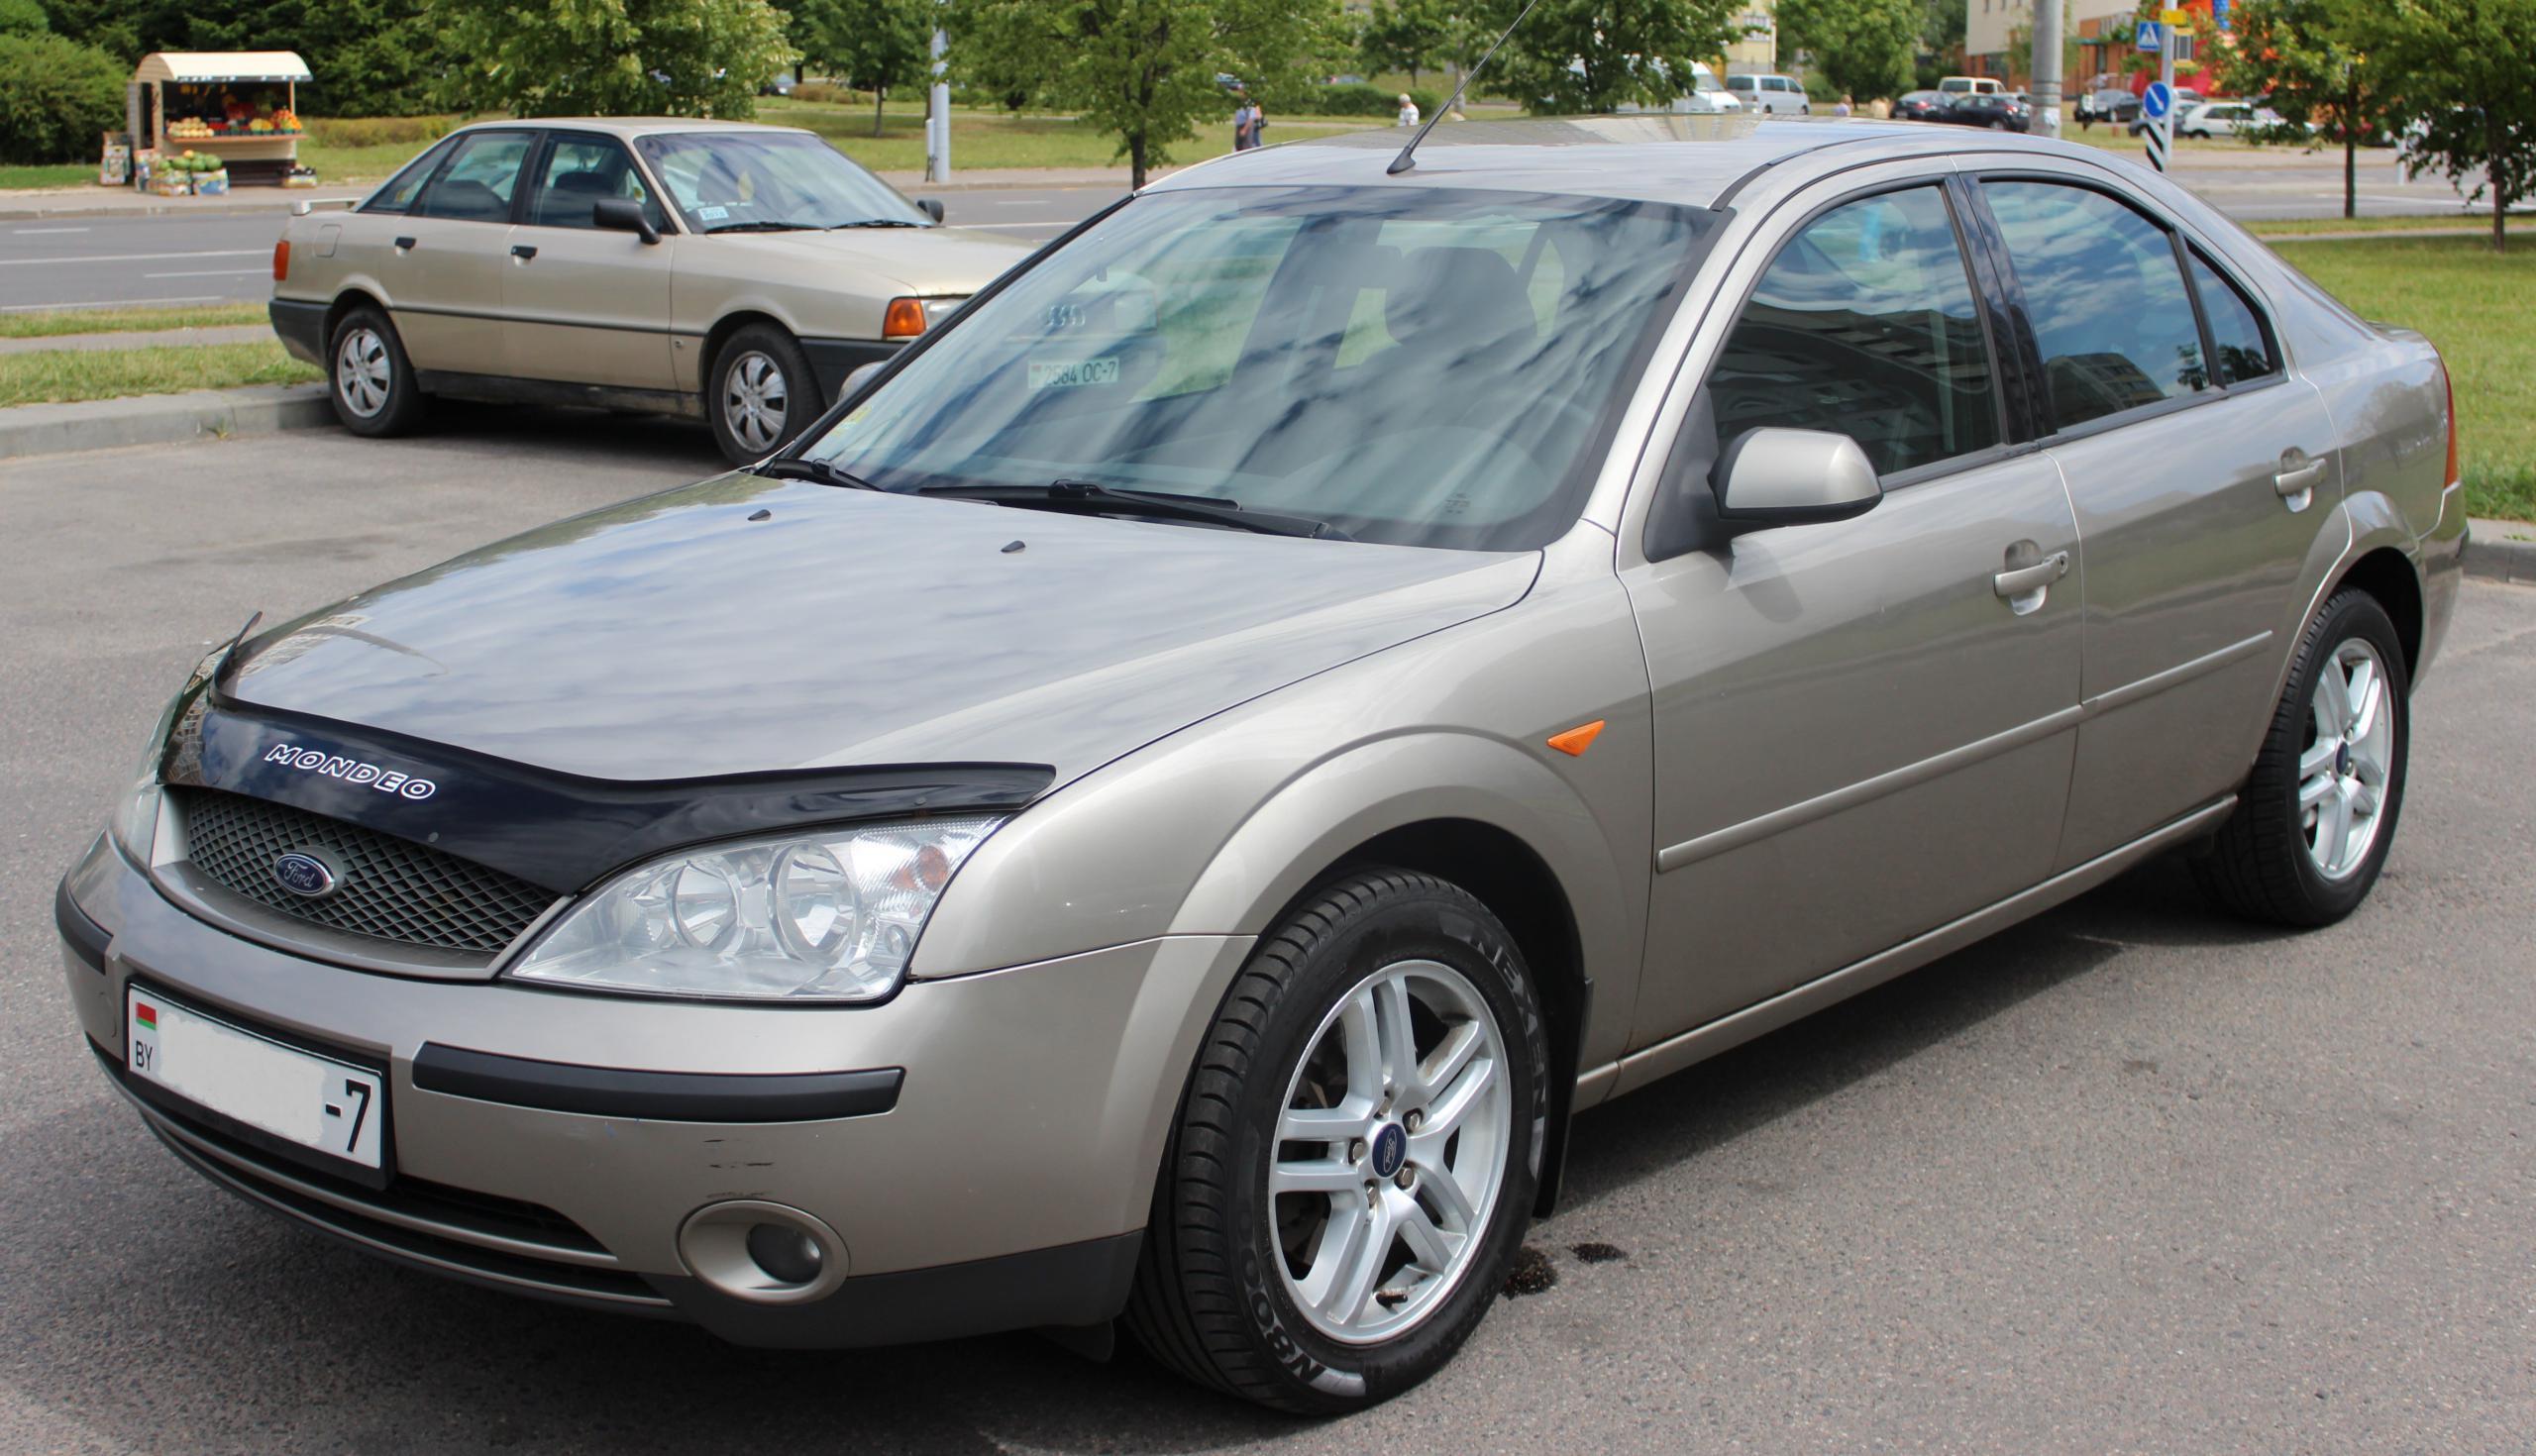 форд мондео 2002 отзывы термобелье необходимо, прежде